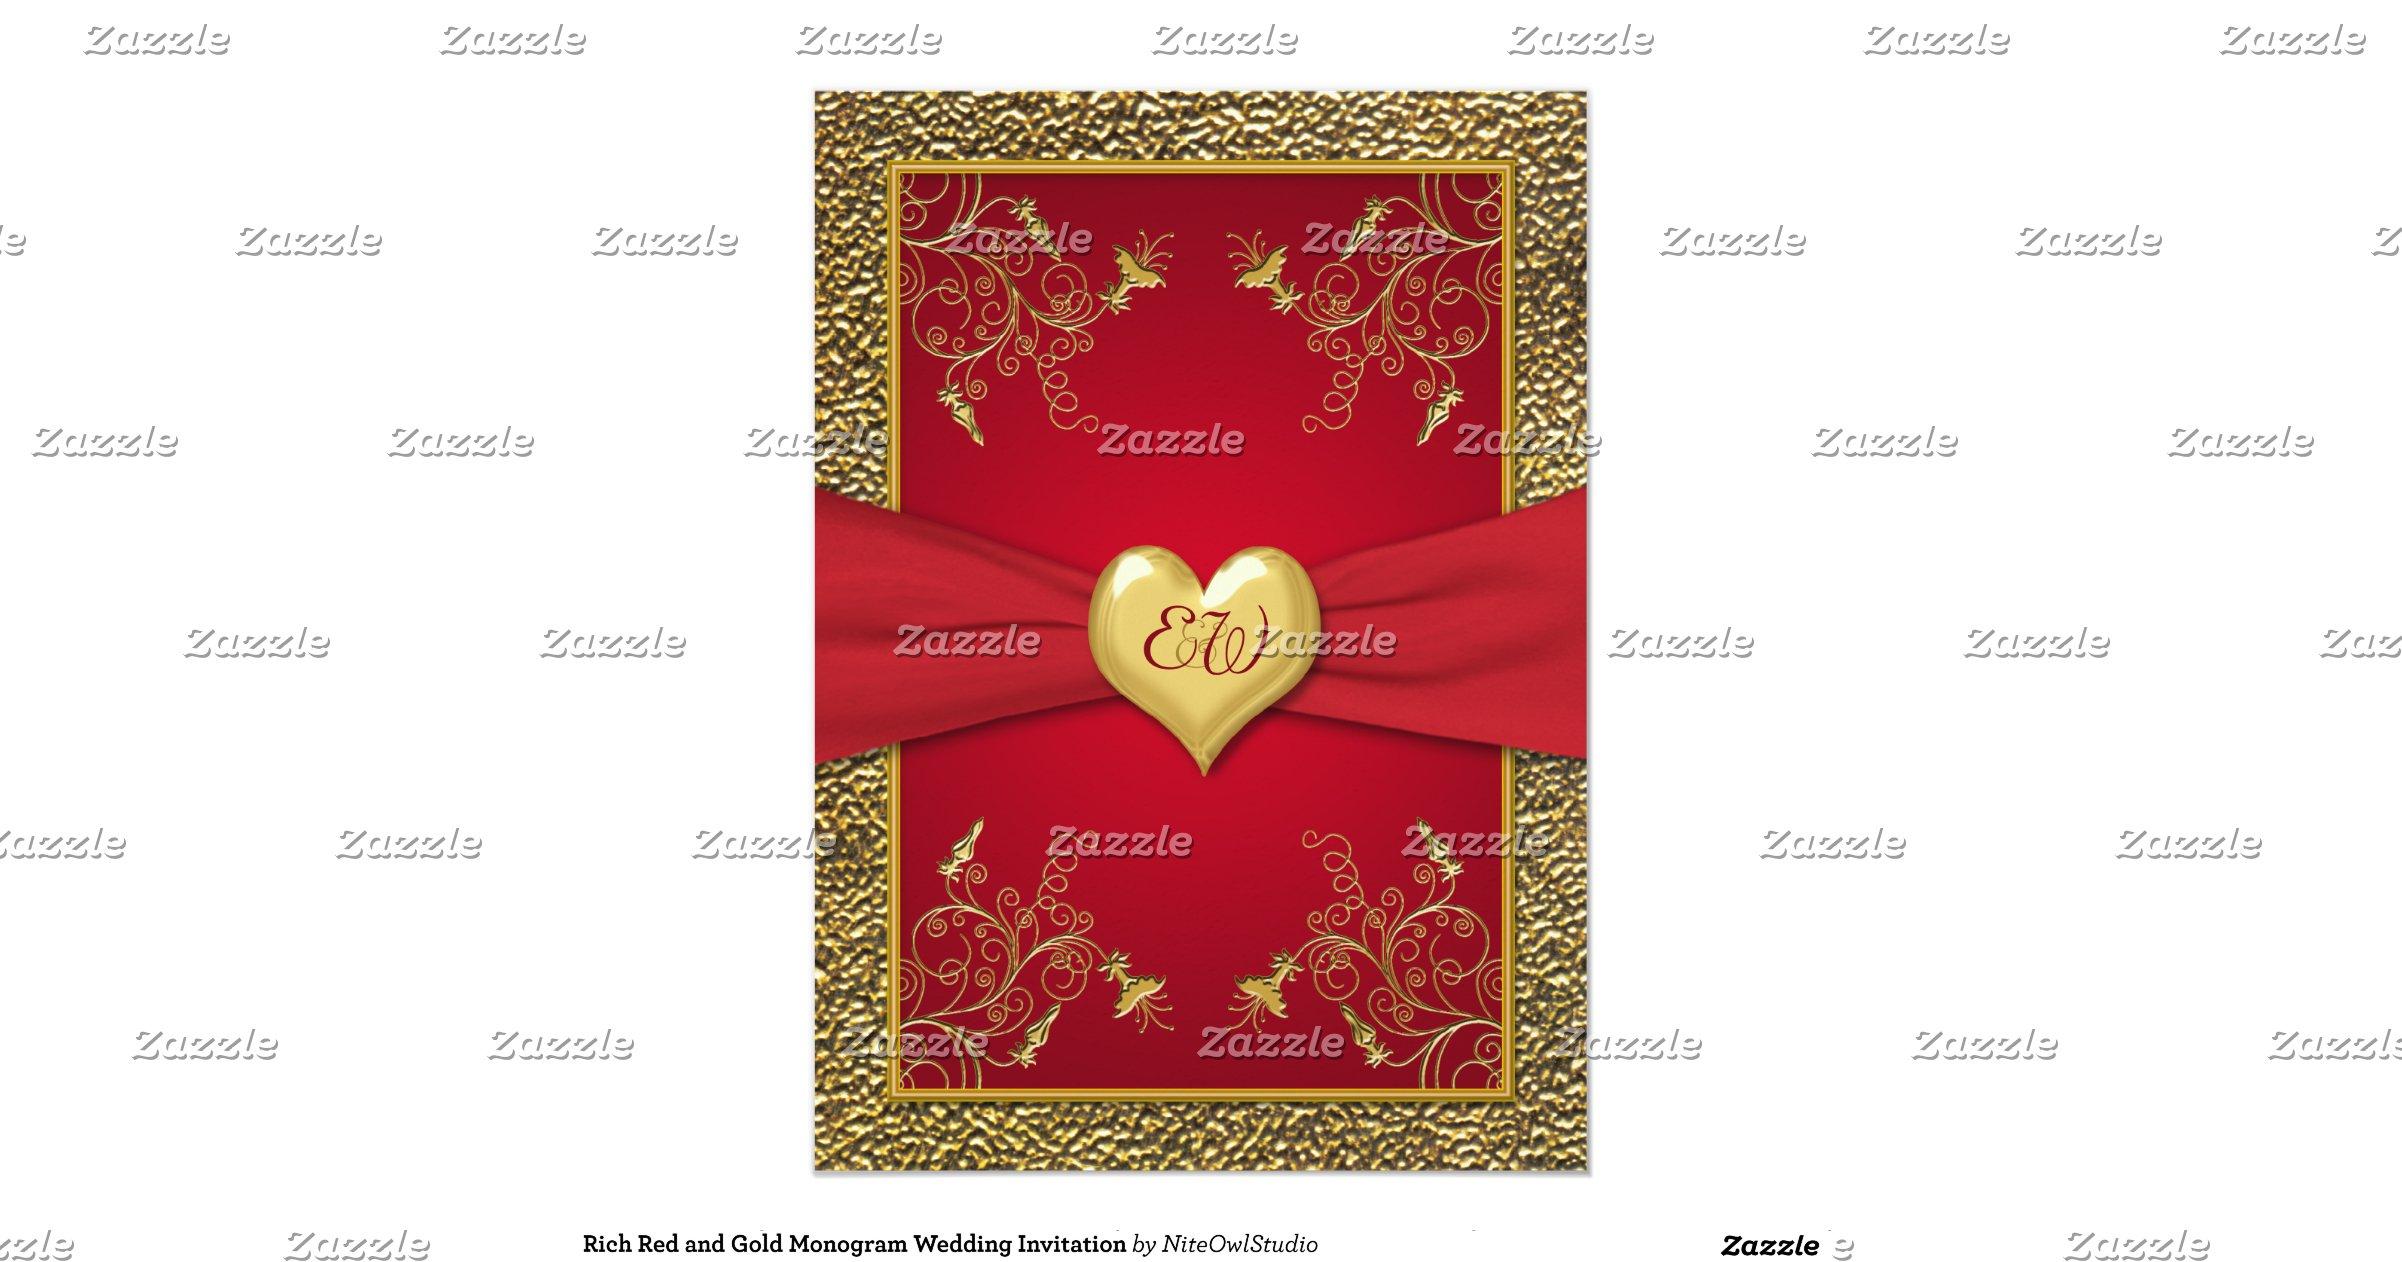 Rich Red And Gold Monogram Wedding Invitation R0da6f200ed034a15b8dcf96e6ecbeb3b Zkrqs 1200